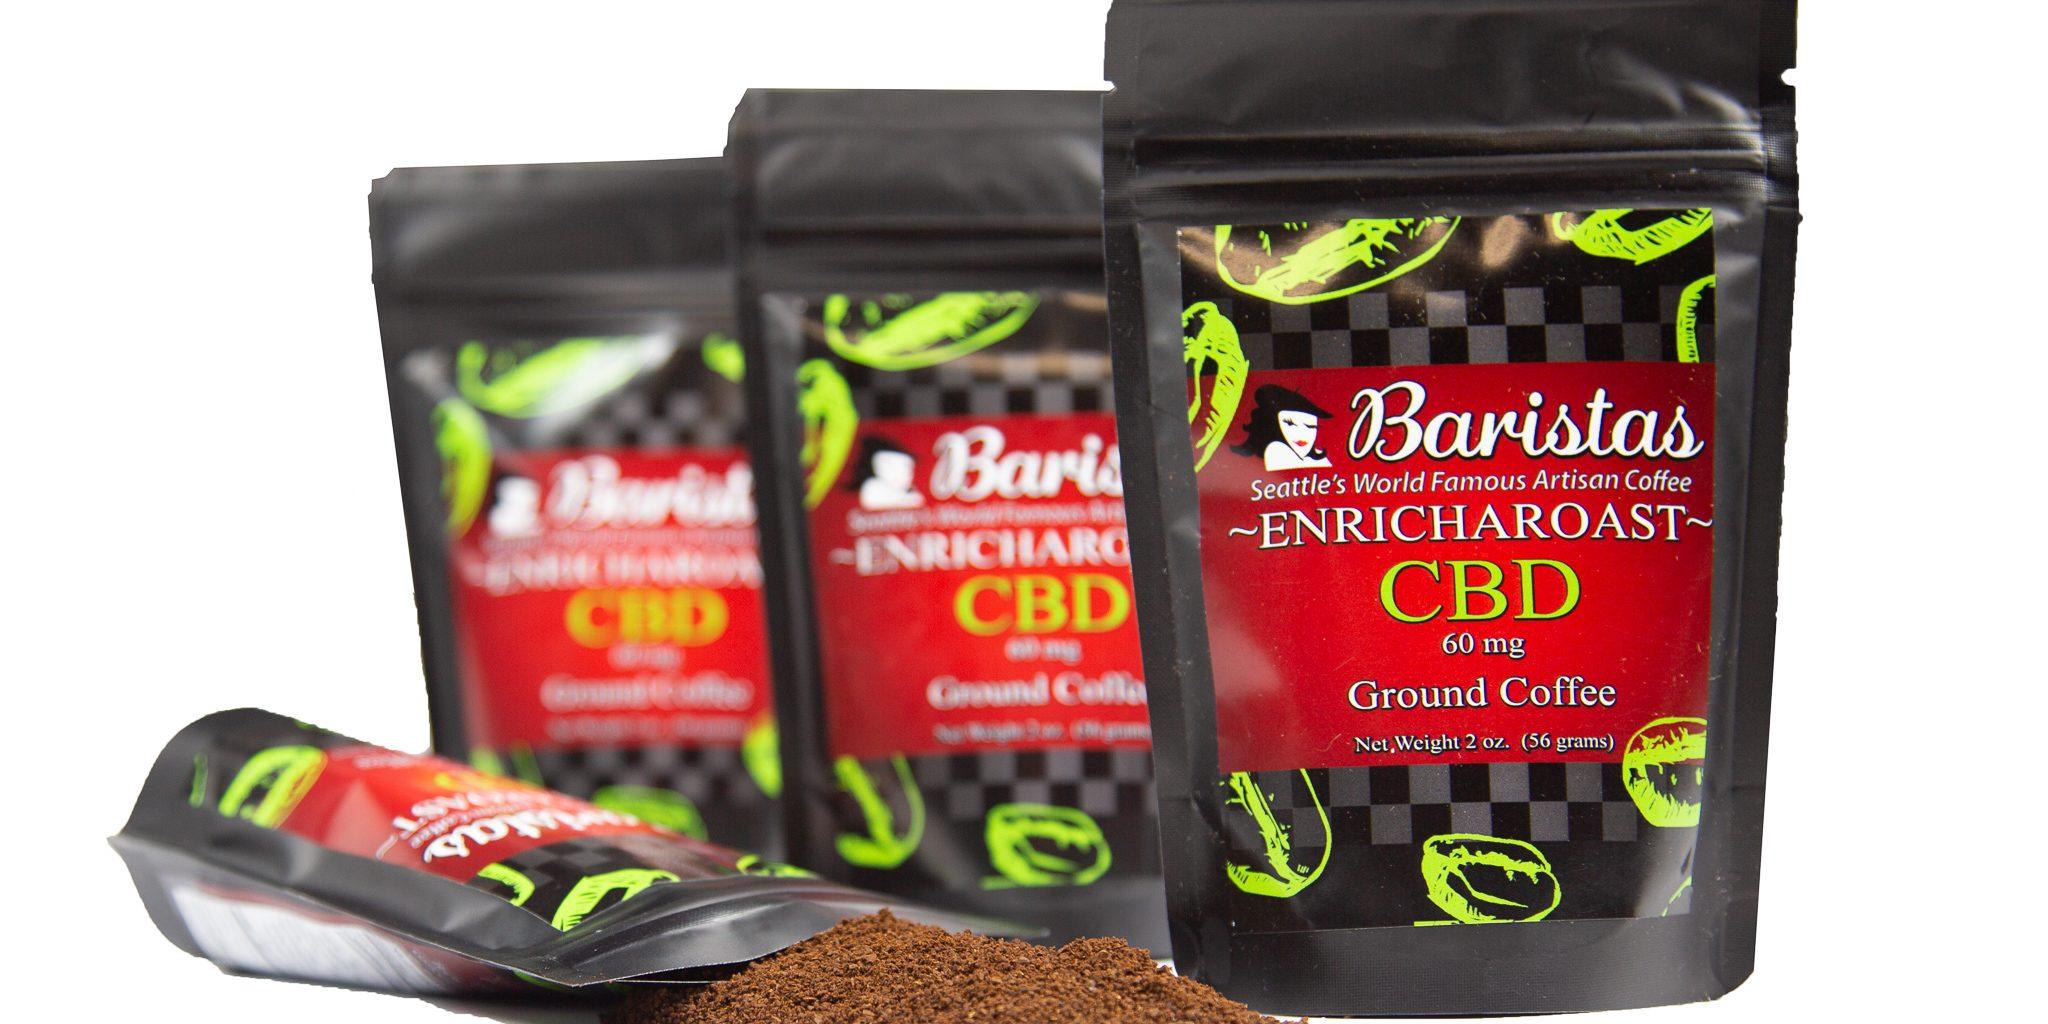 Baristas Coffee Company Inc (OTCMKTS: BCCI) Stock Soars High